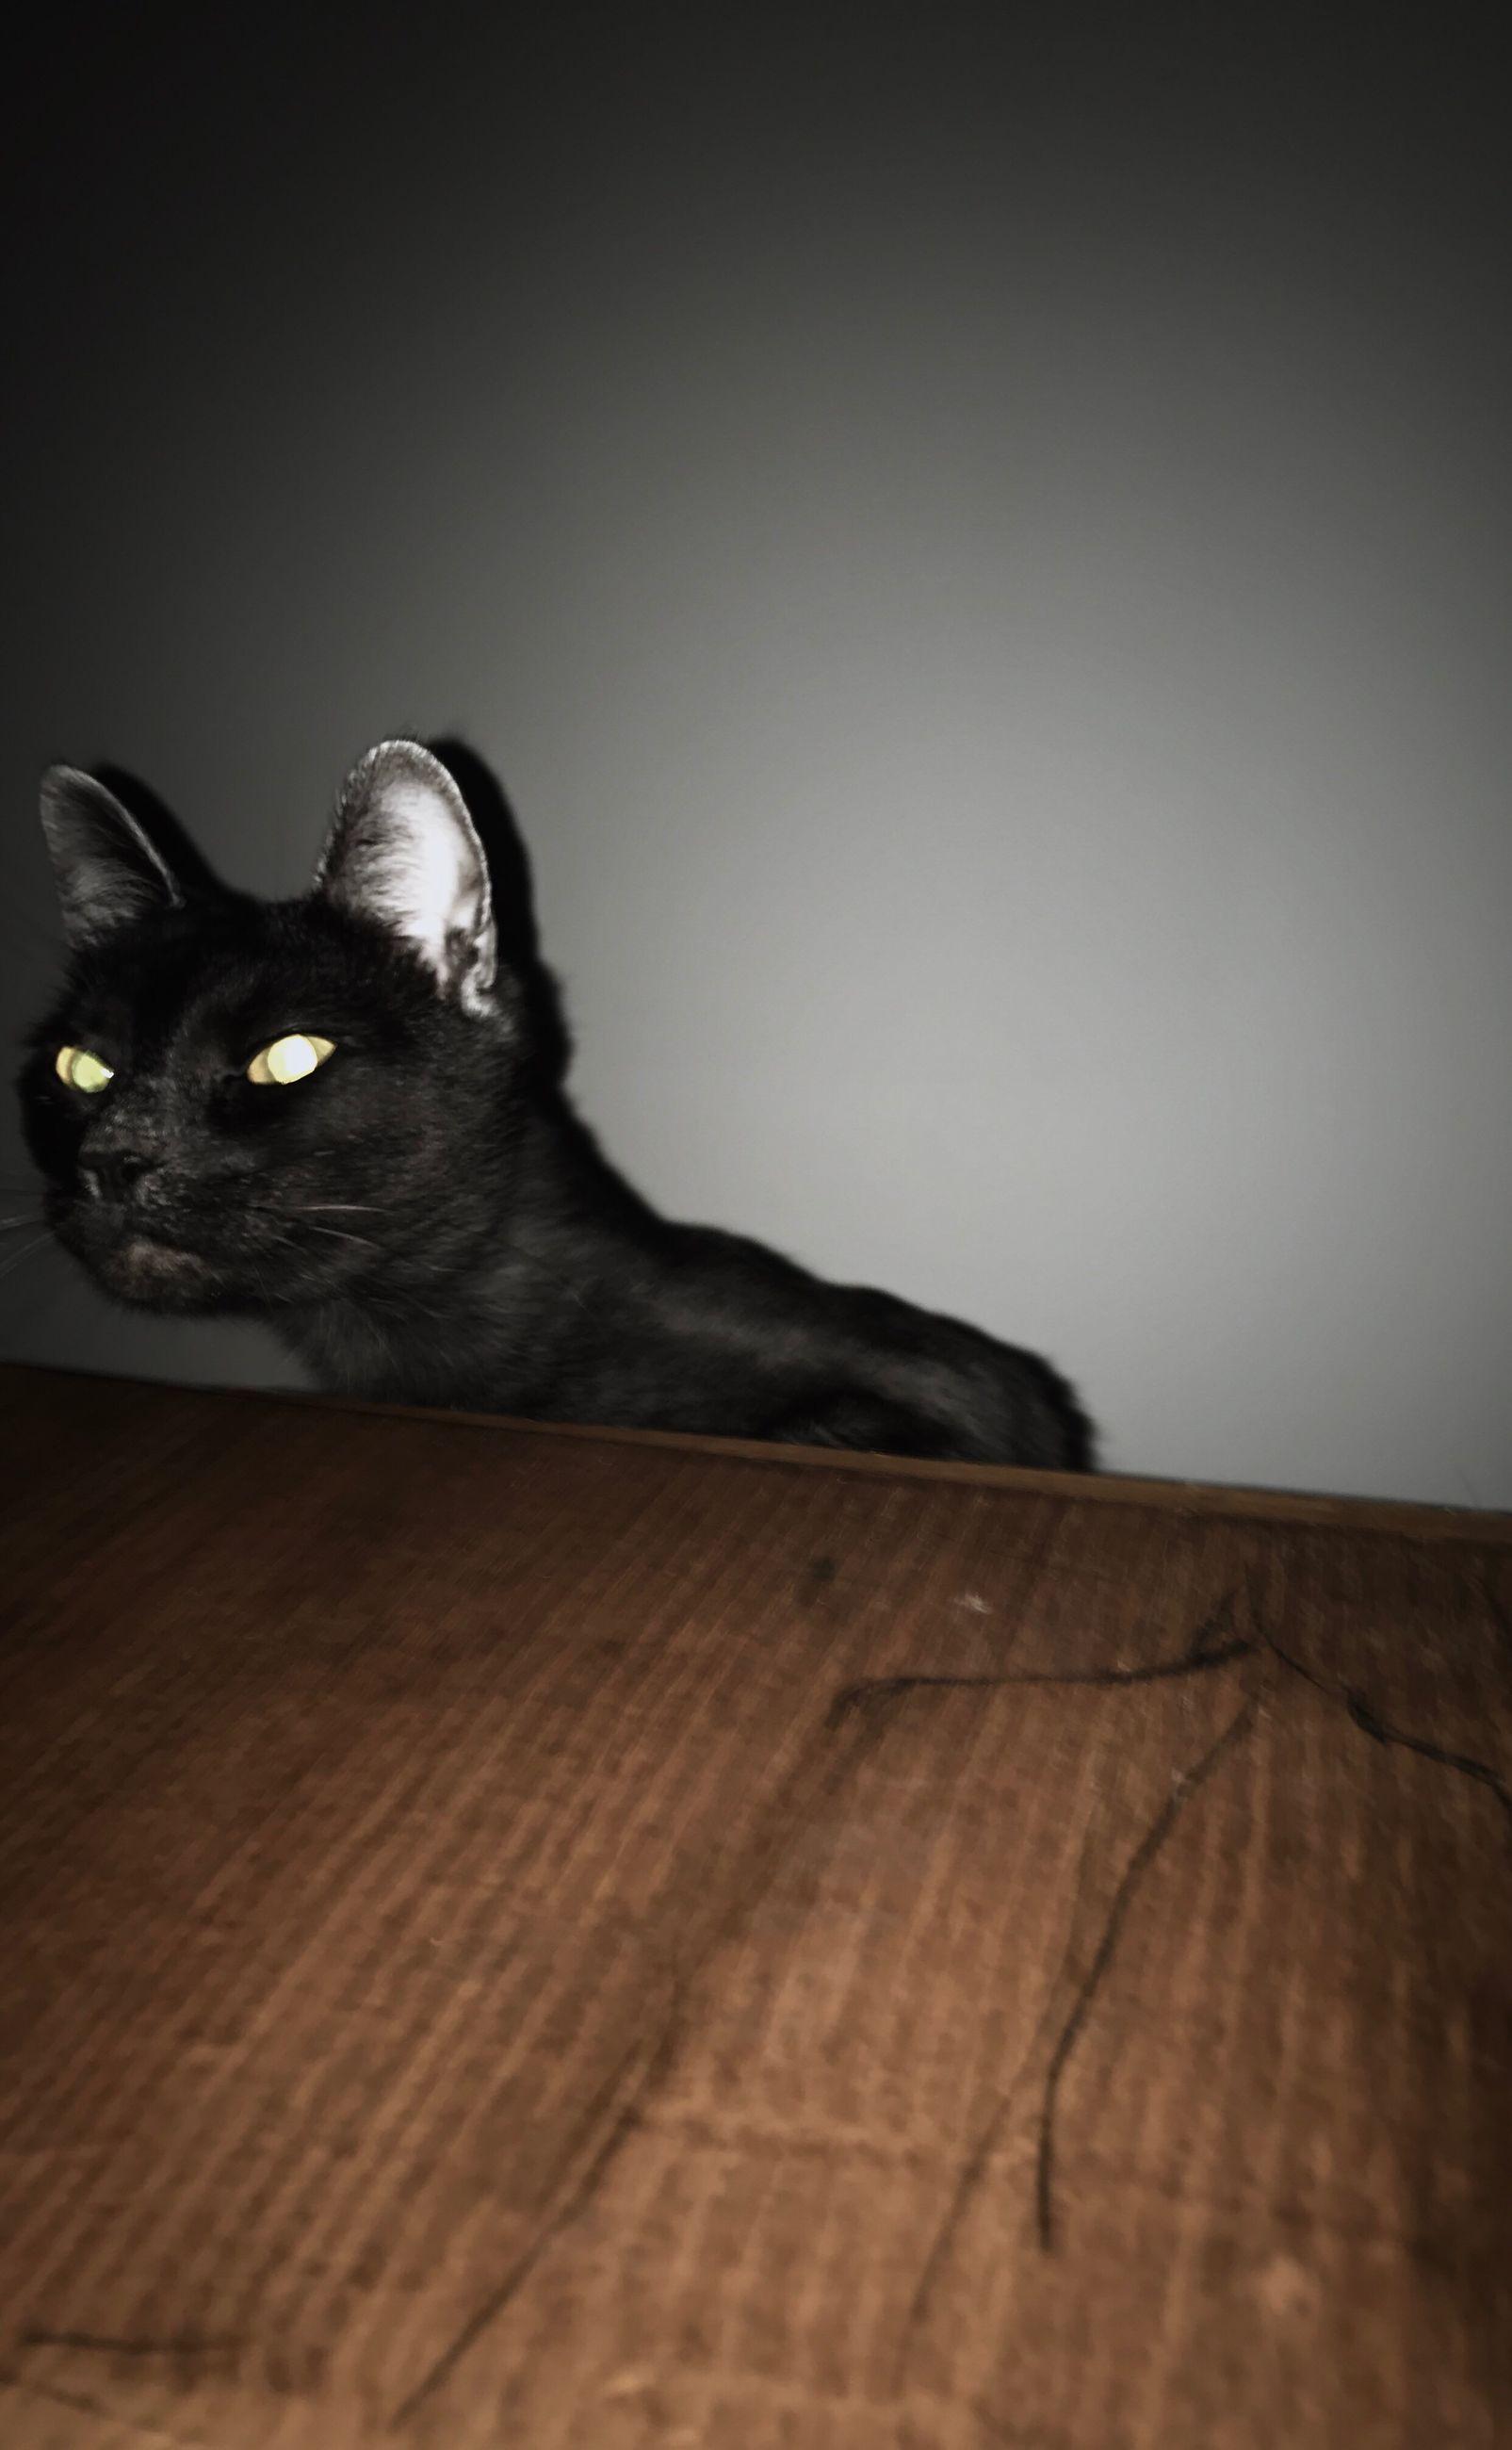 pets, one animal, domestic animals, mammal, animal themes, indoors, domestic cat, no people, feline, animal eye, close-up, day